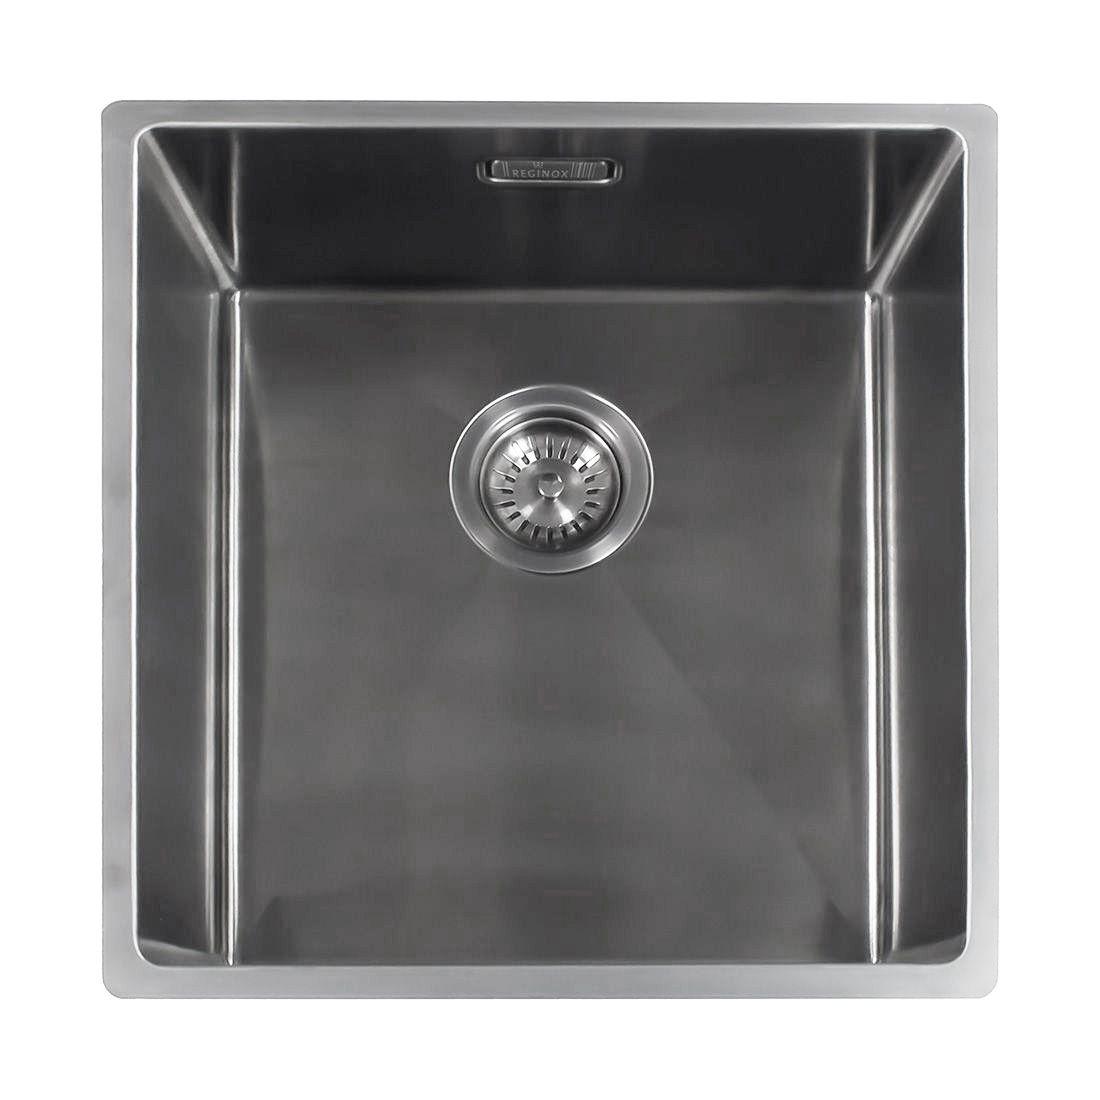 Reginox Miami 40x40 Single Bowl Kitchen Sink Sinks Taps Com